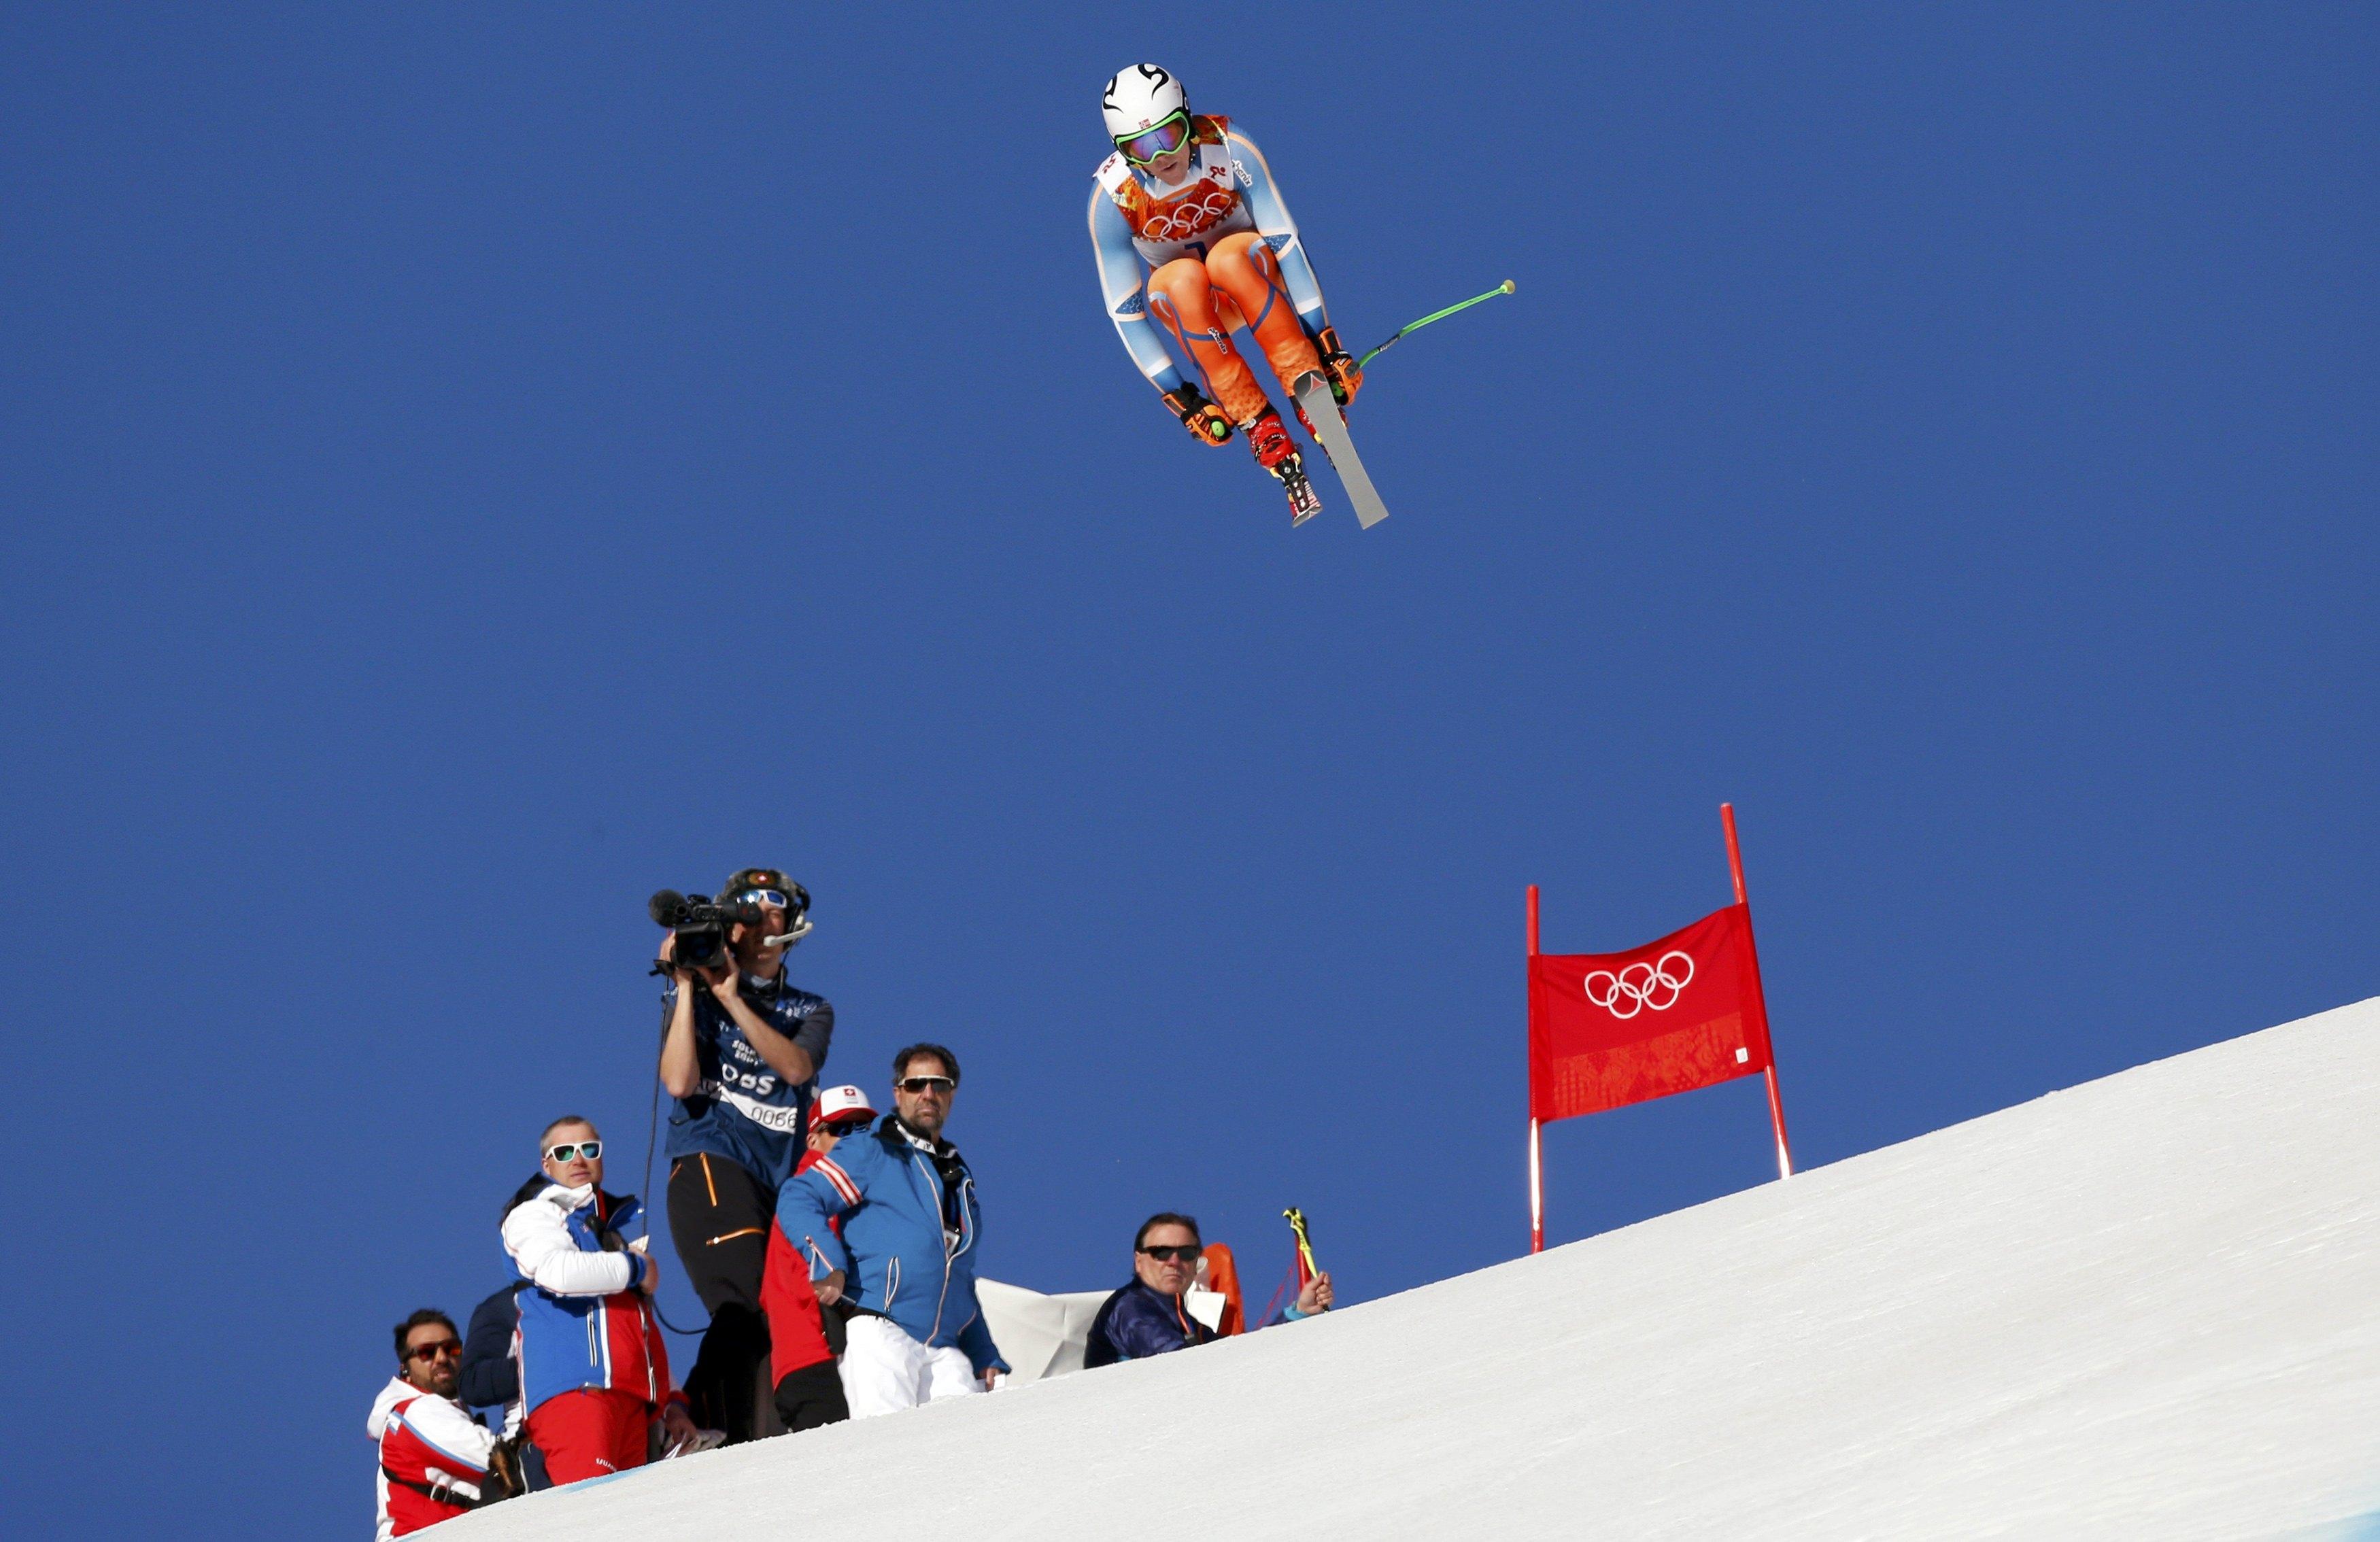 2014 sochi winter olympics february 14 2014 reuters ruben sprich